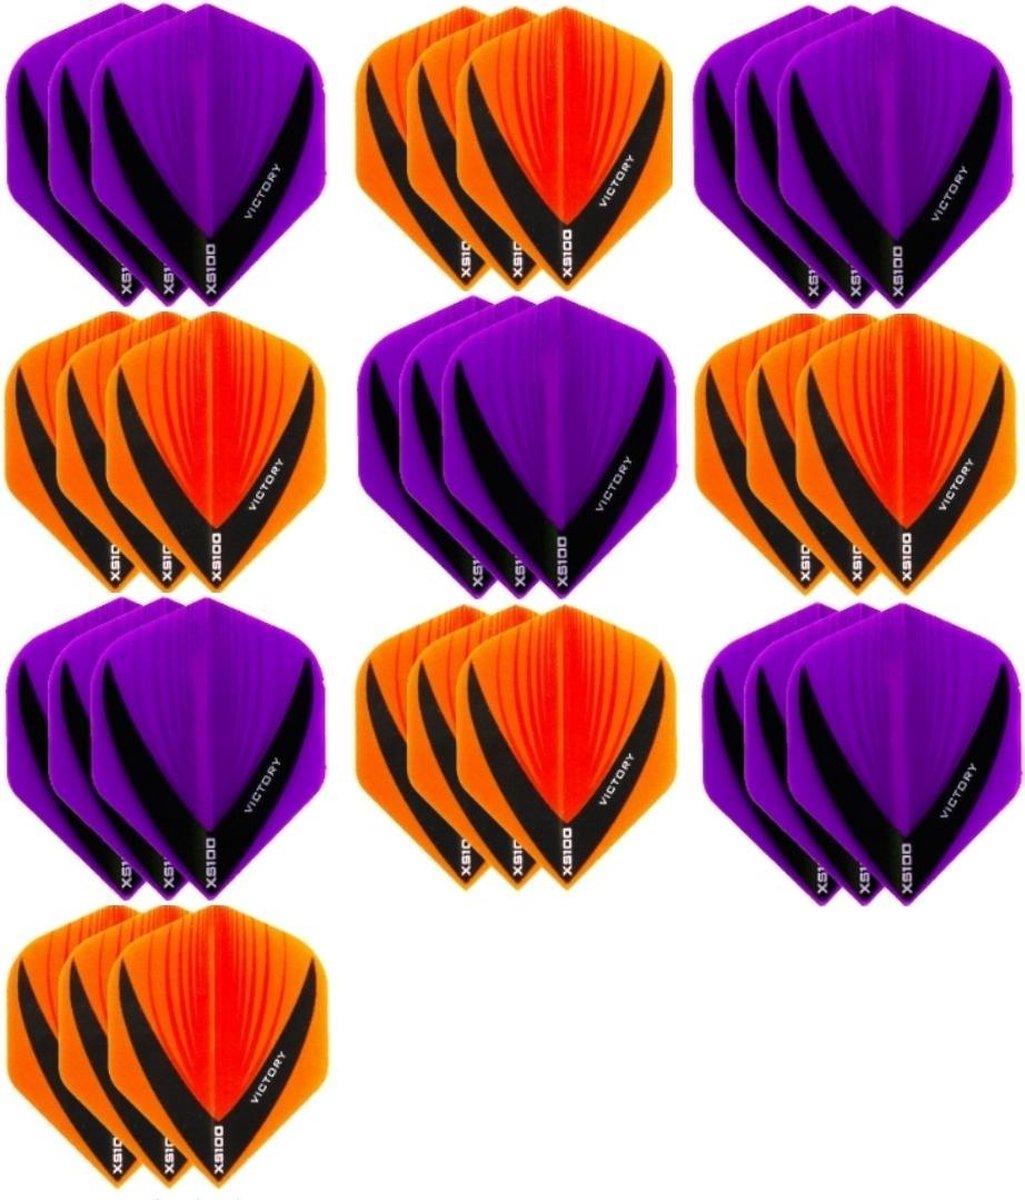 10 sets (30 stuks) - XS100 Vista flights - duo kleur pakket - Oranje en Paars - flights - dartflights